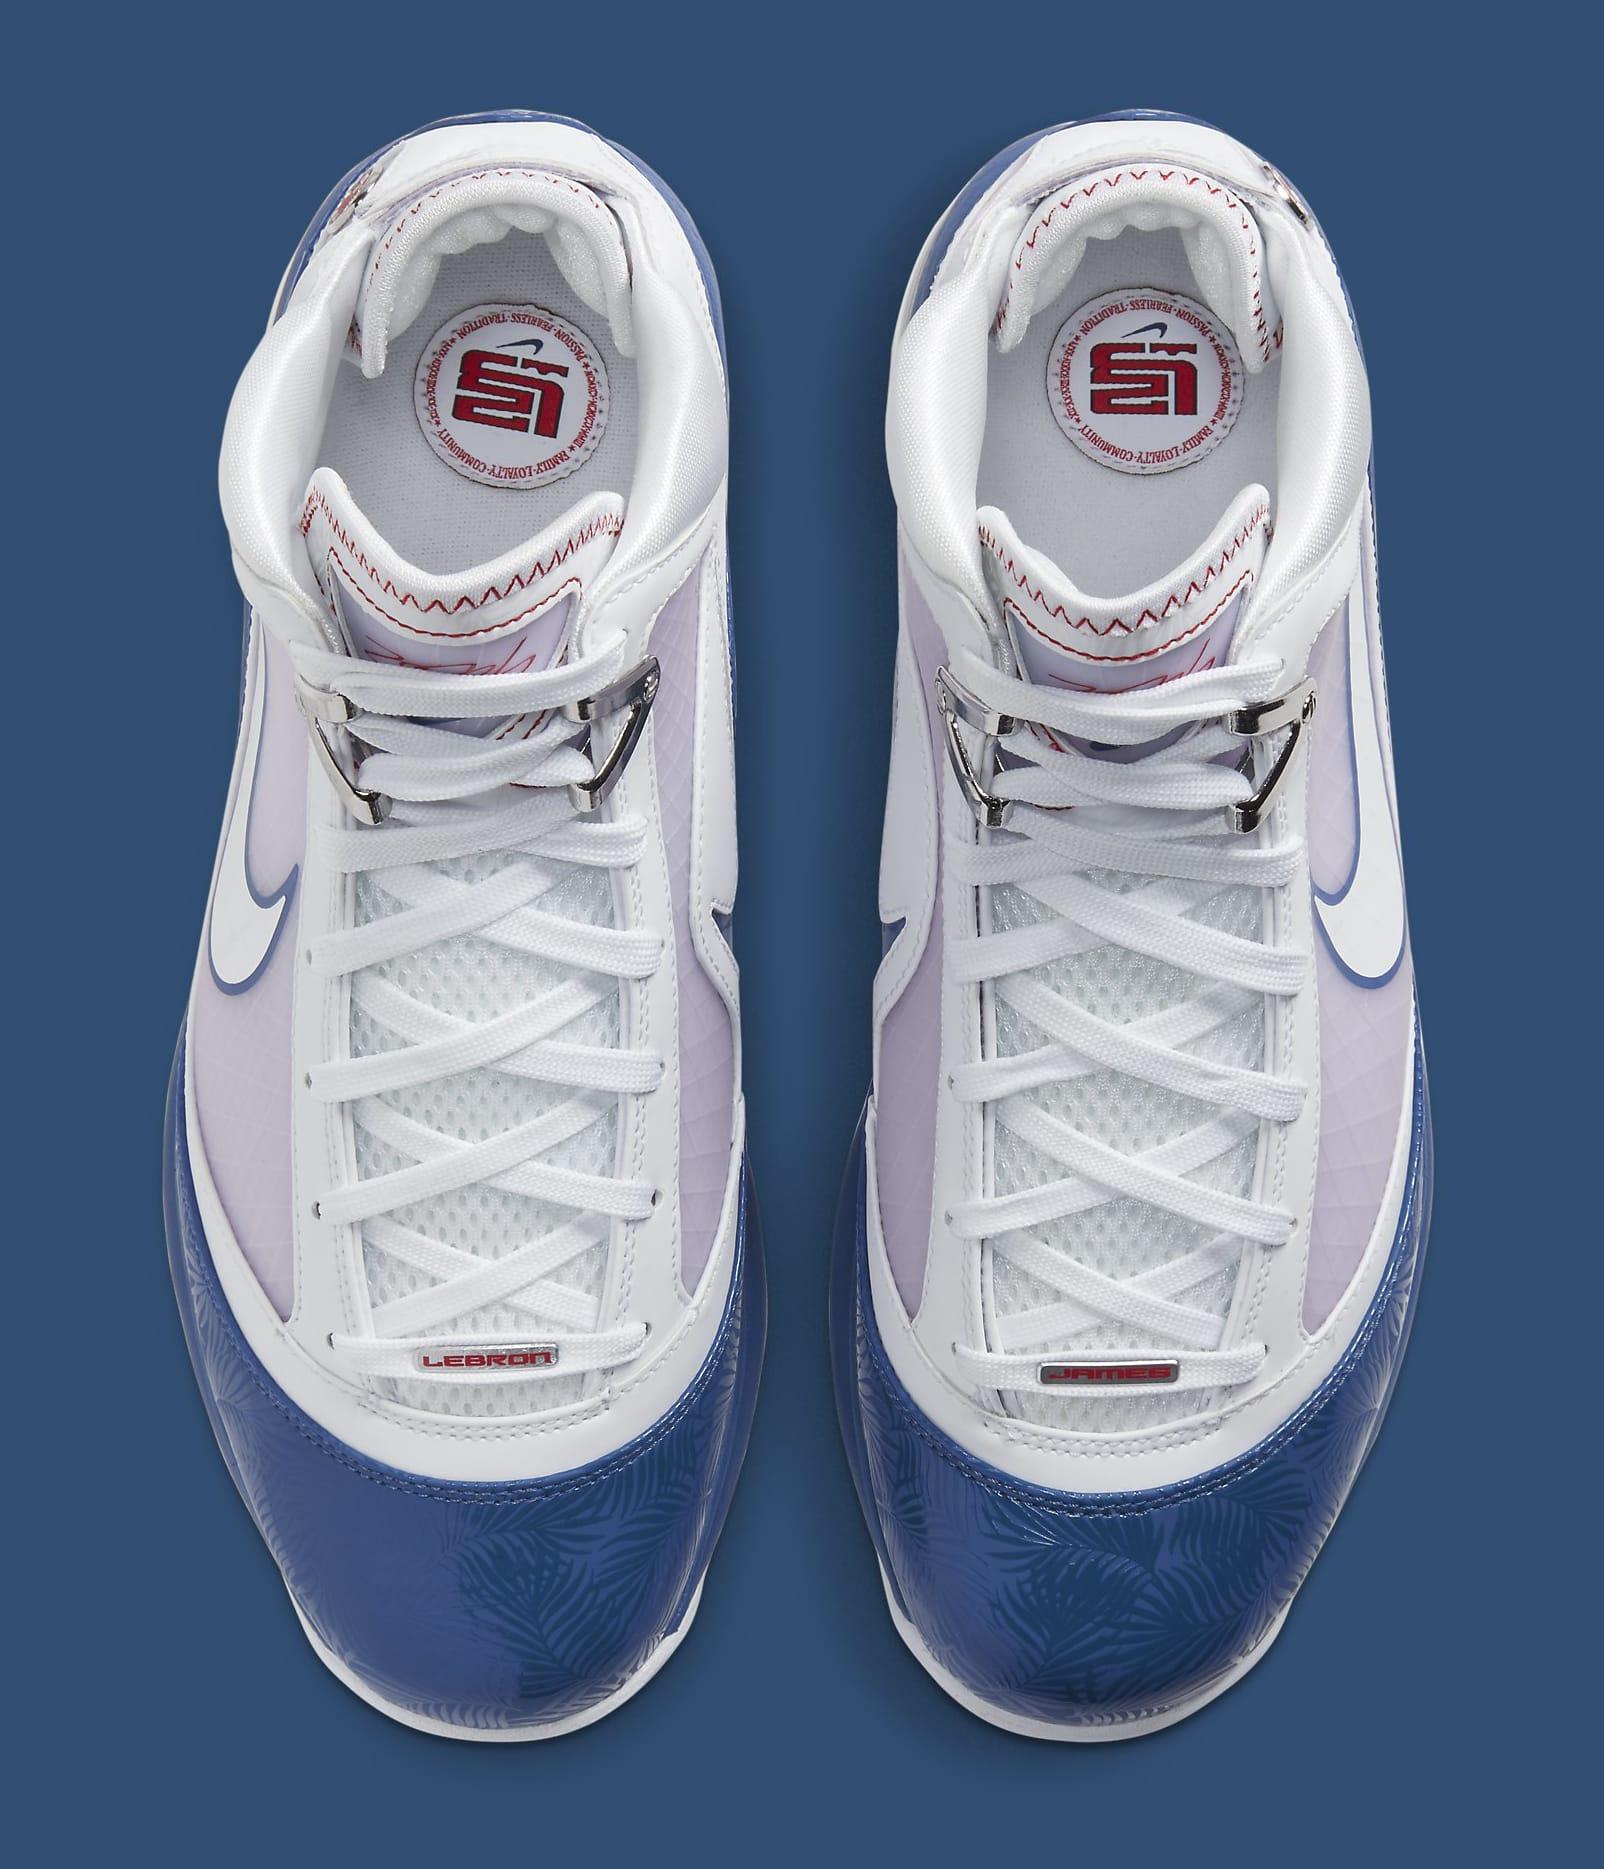 Nike LeBron 7 'Dodgers' DJ5158-100 Top